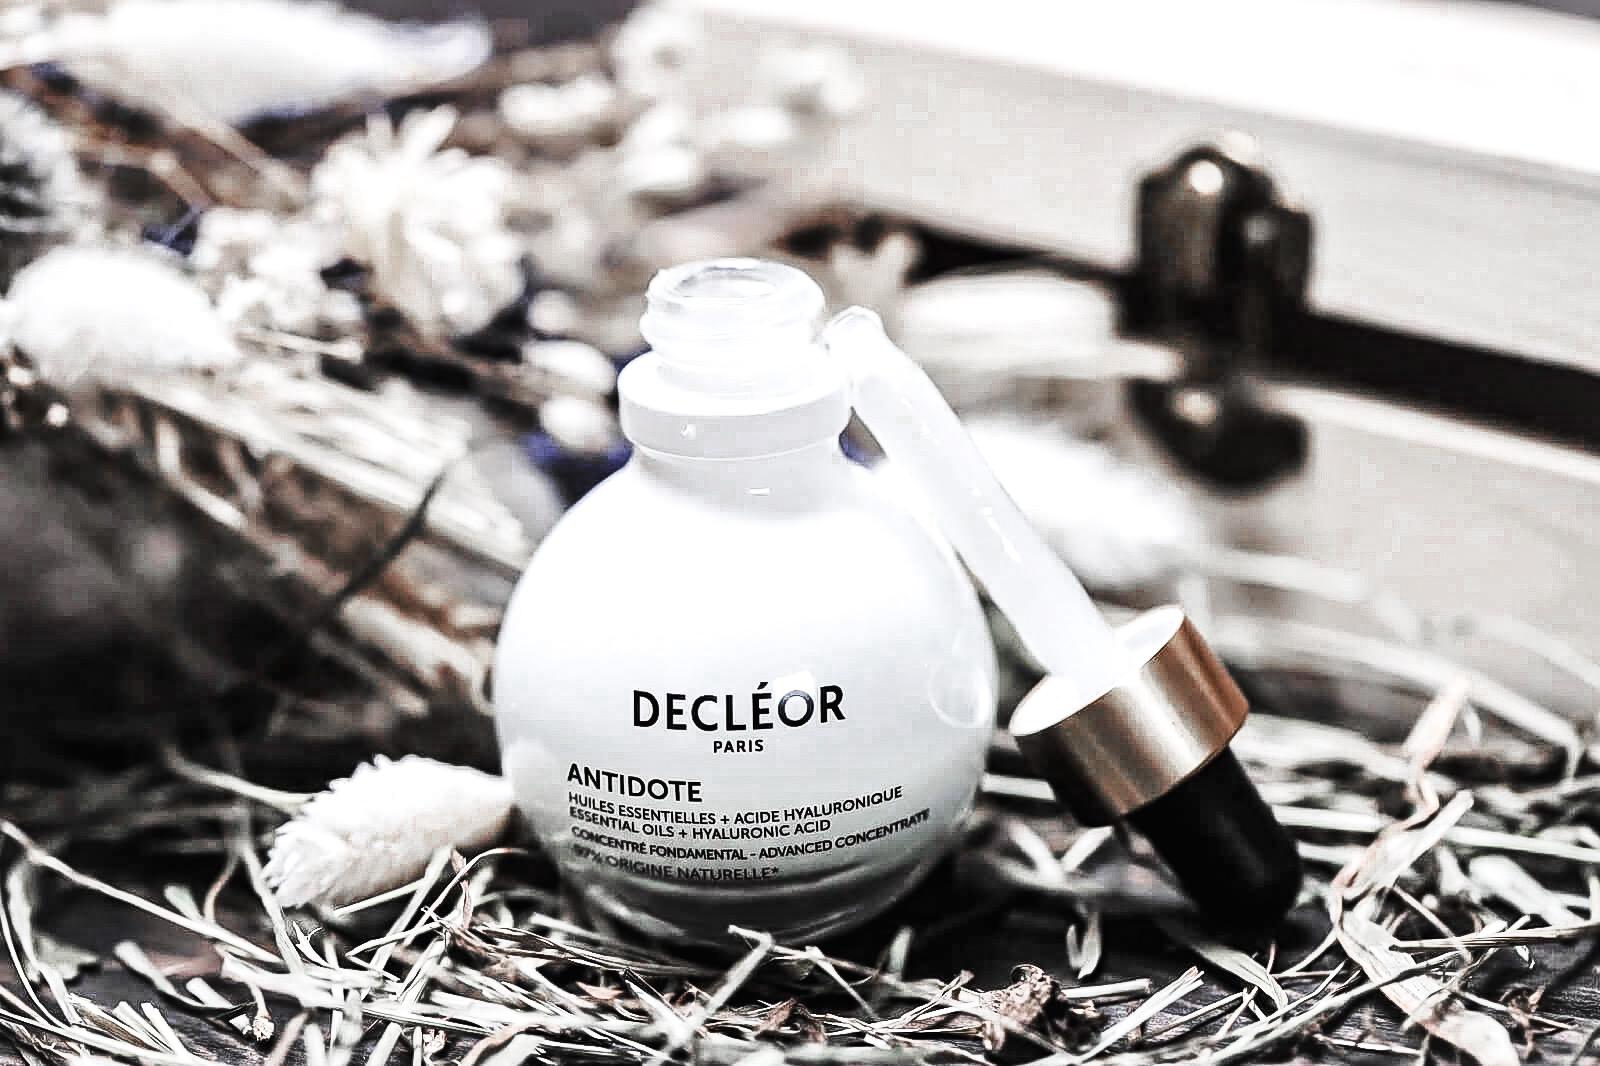 Decleor Antidote Avis